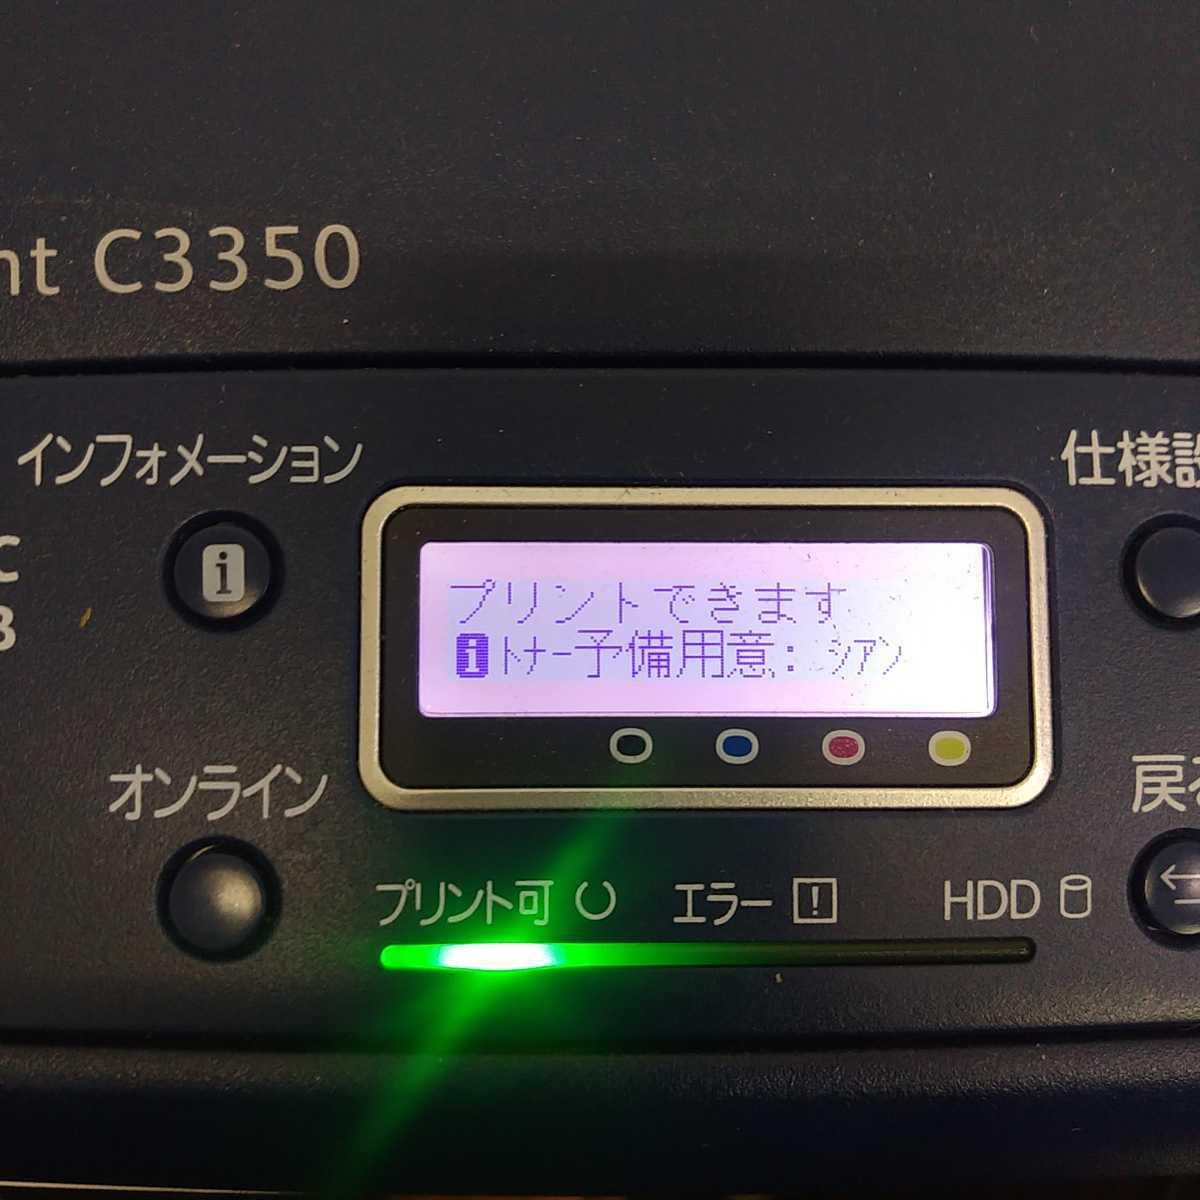 FUJI XEROX DocuPrint C3350 レーザープリンター 通電確認済み 現状品 プリンター 格安売り切りスタート☆_画像3